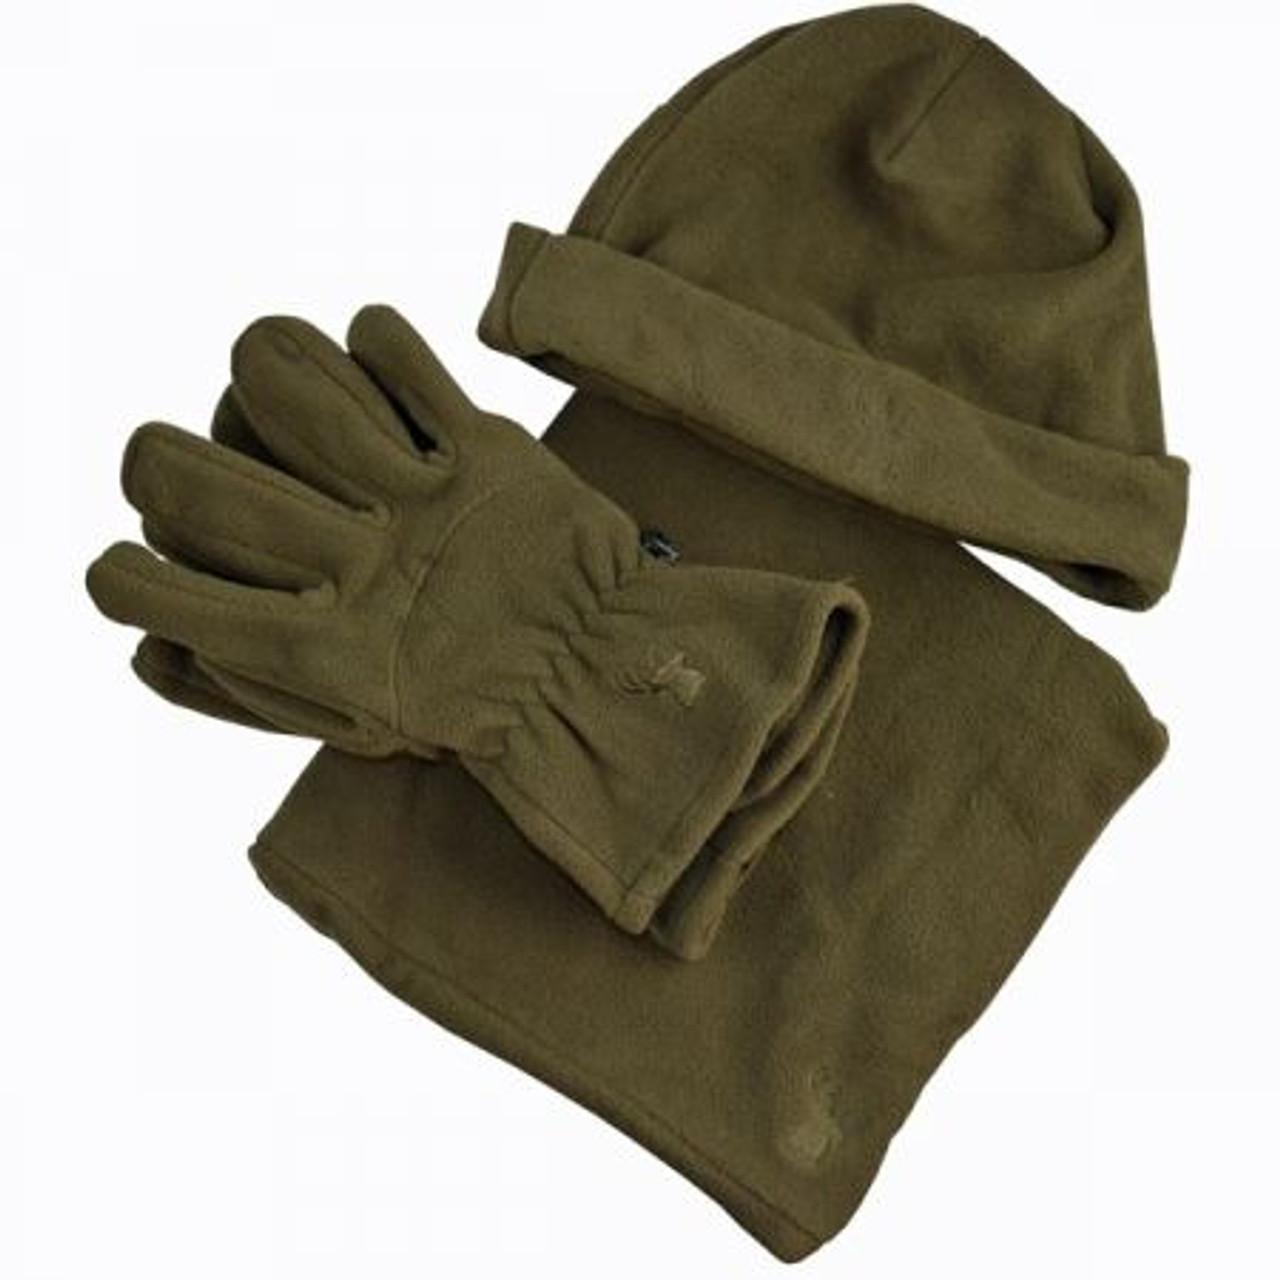 Hart Compton Hat, Glove and Snood Set